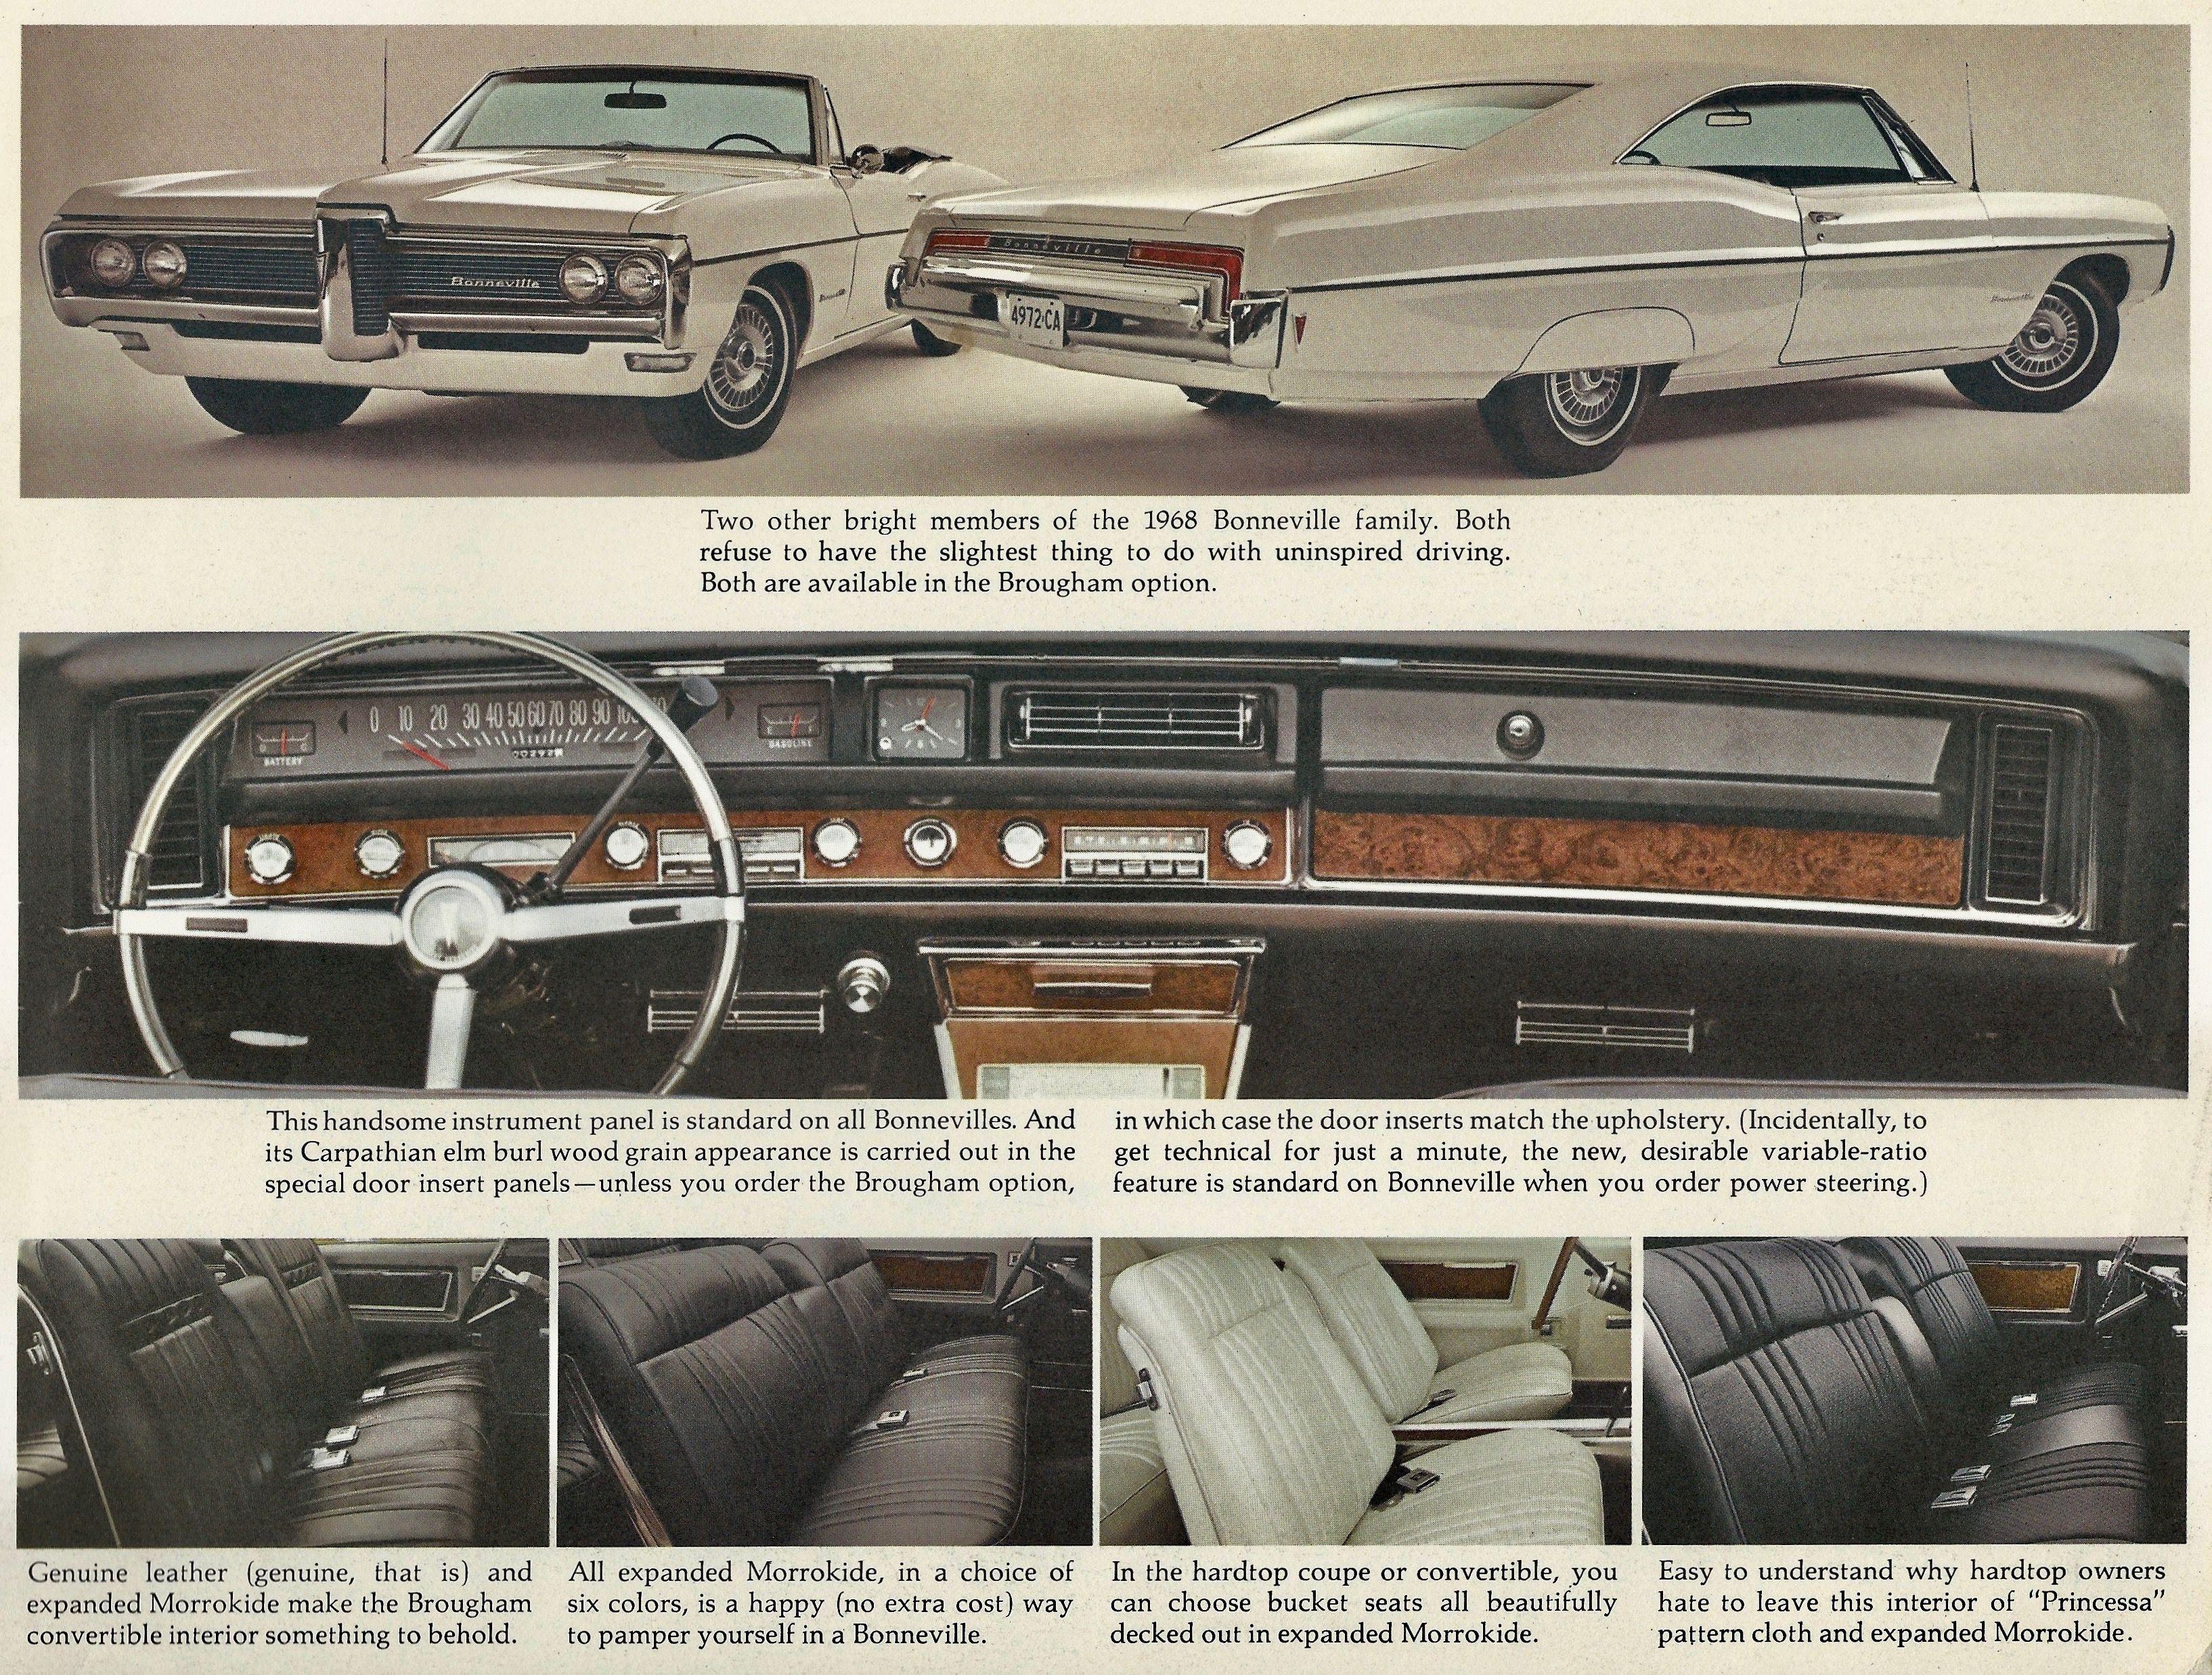 Bonneville Catalina Tempest 1968 Pontiac 16-page Station Wagon Car Brochure